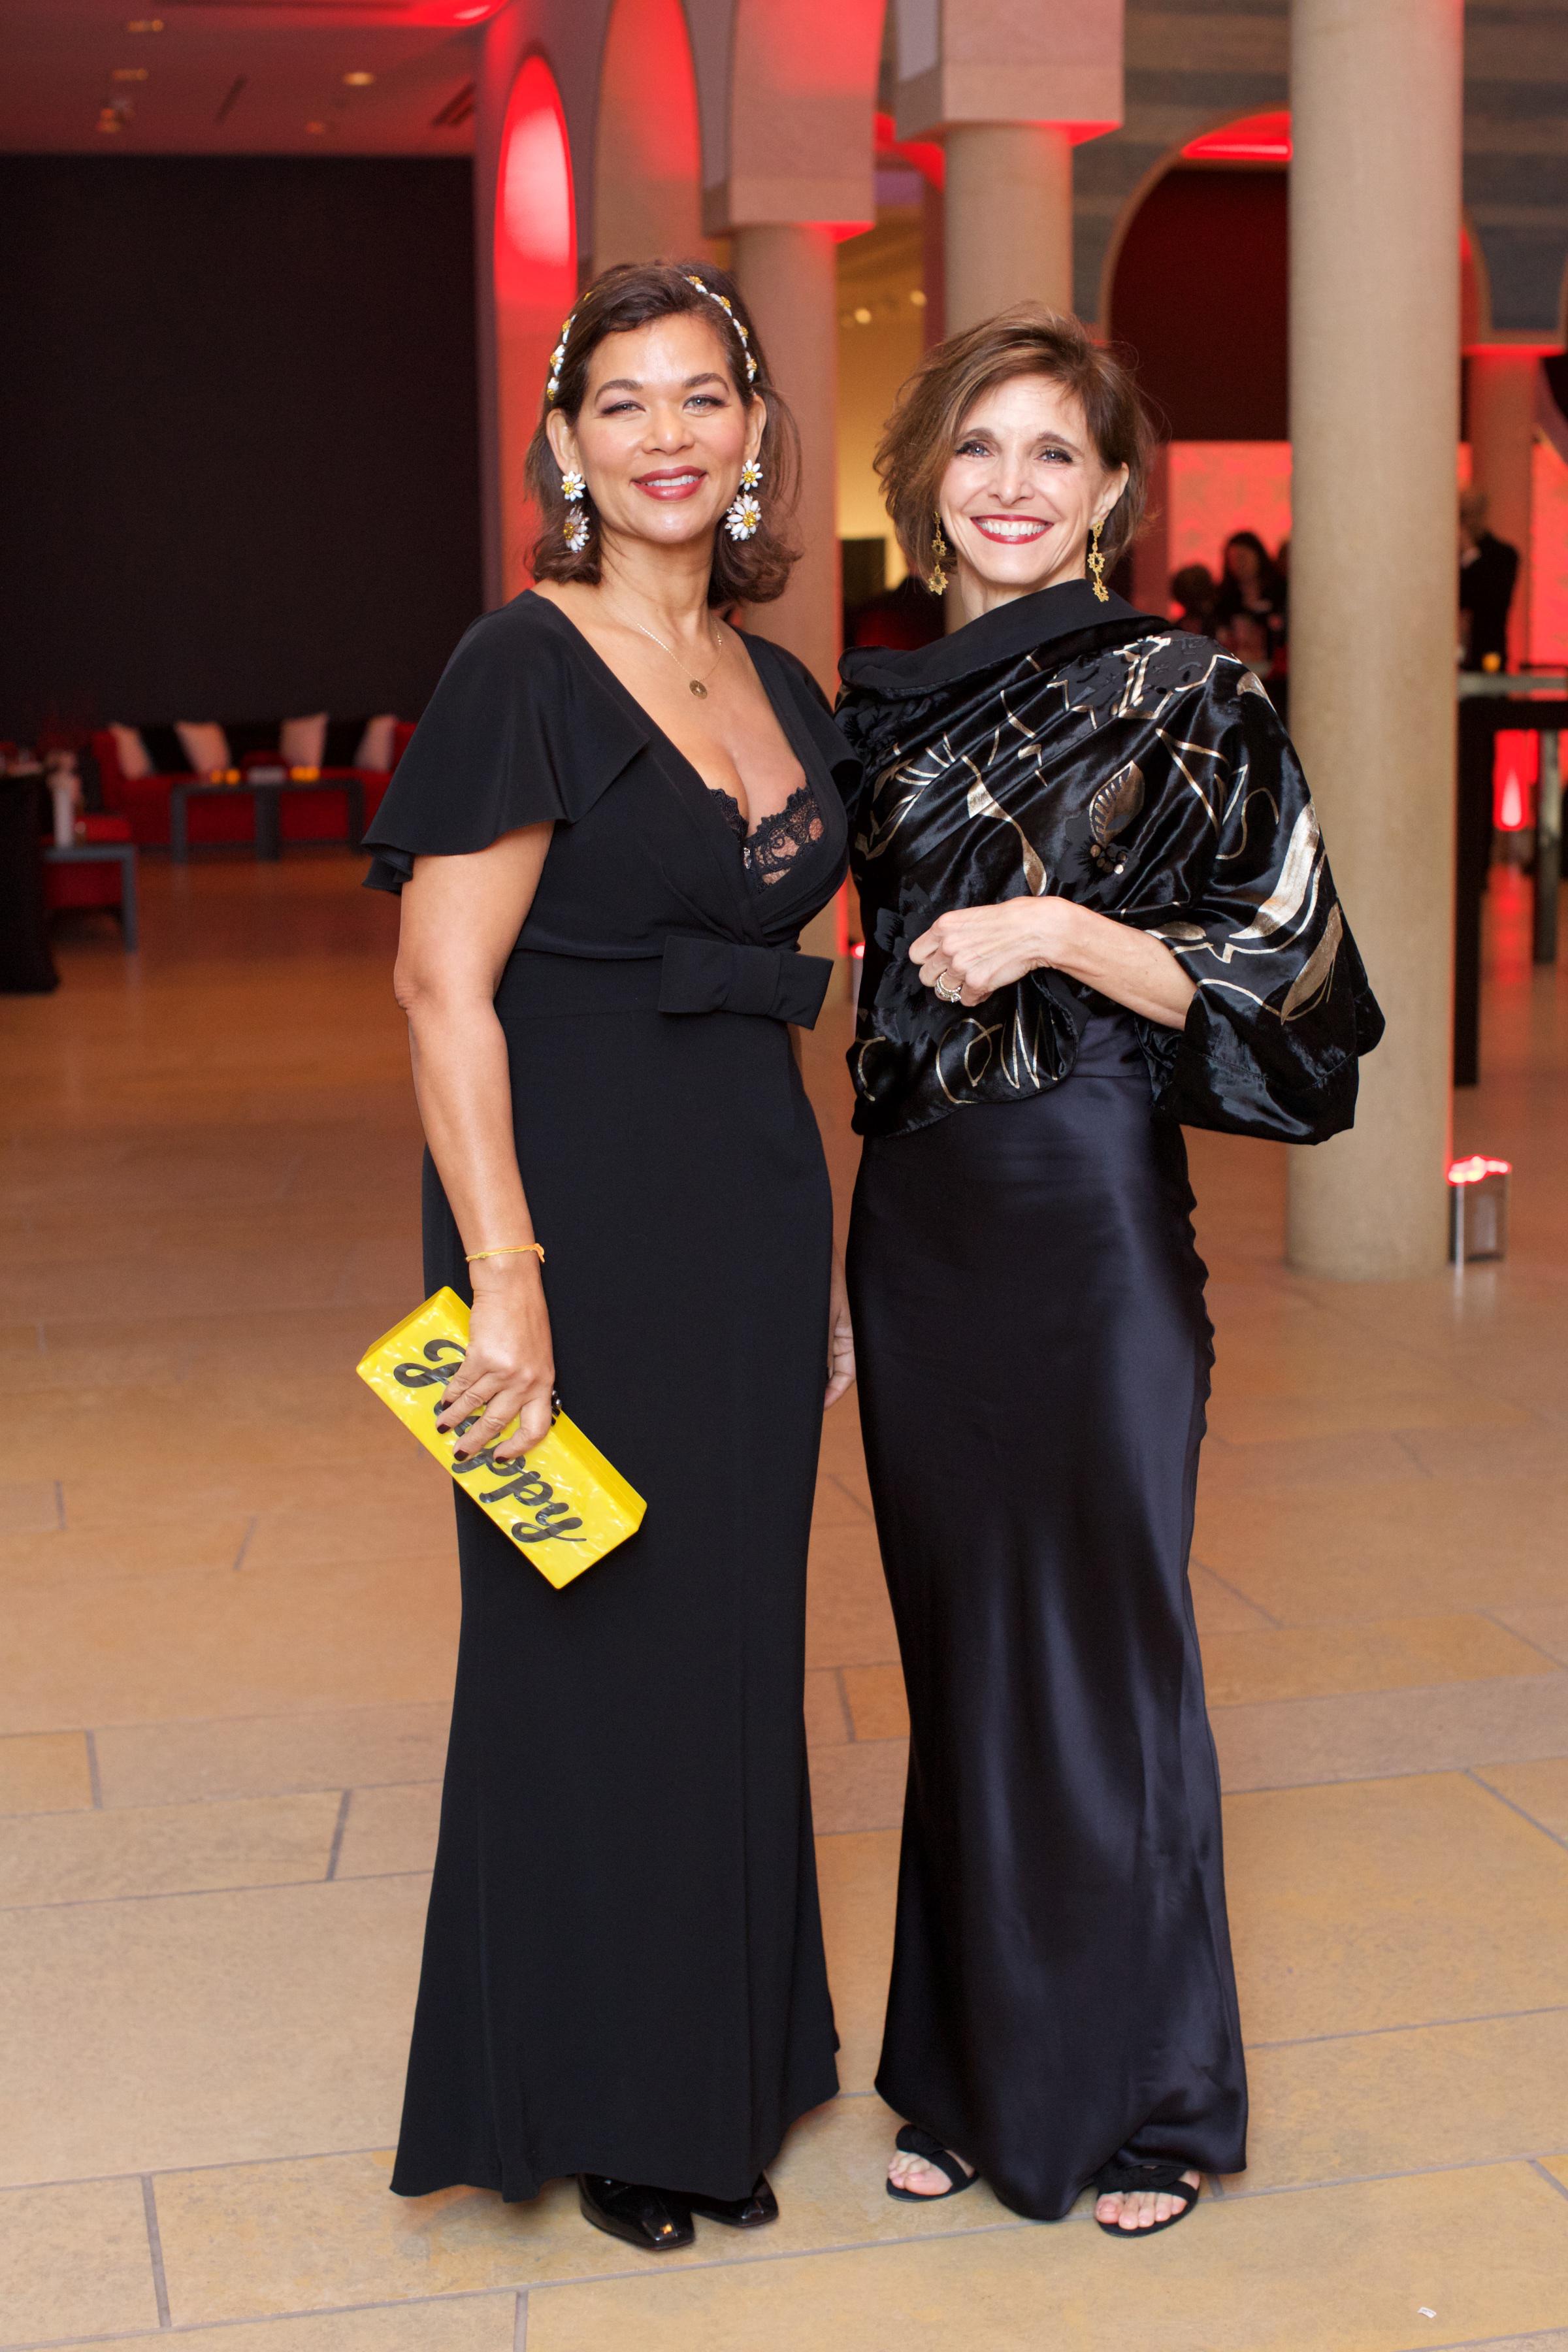 Suzanne McFayden and Debbie Dupre